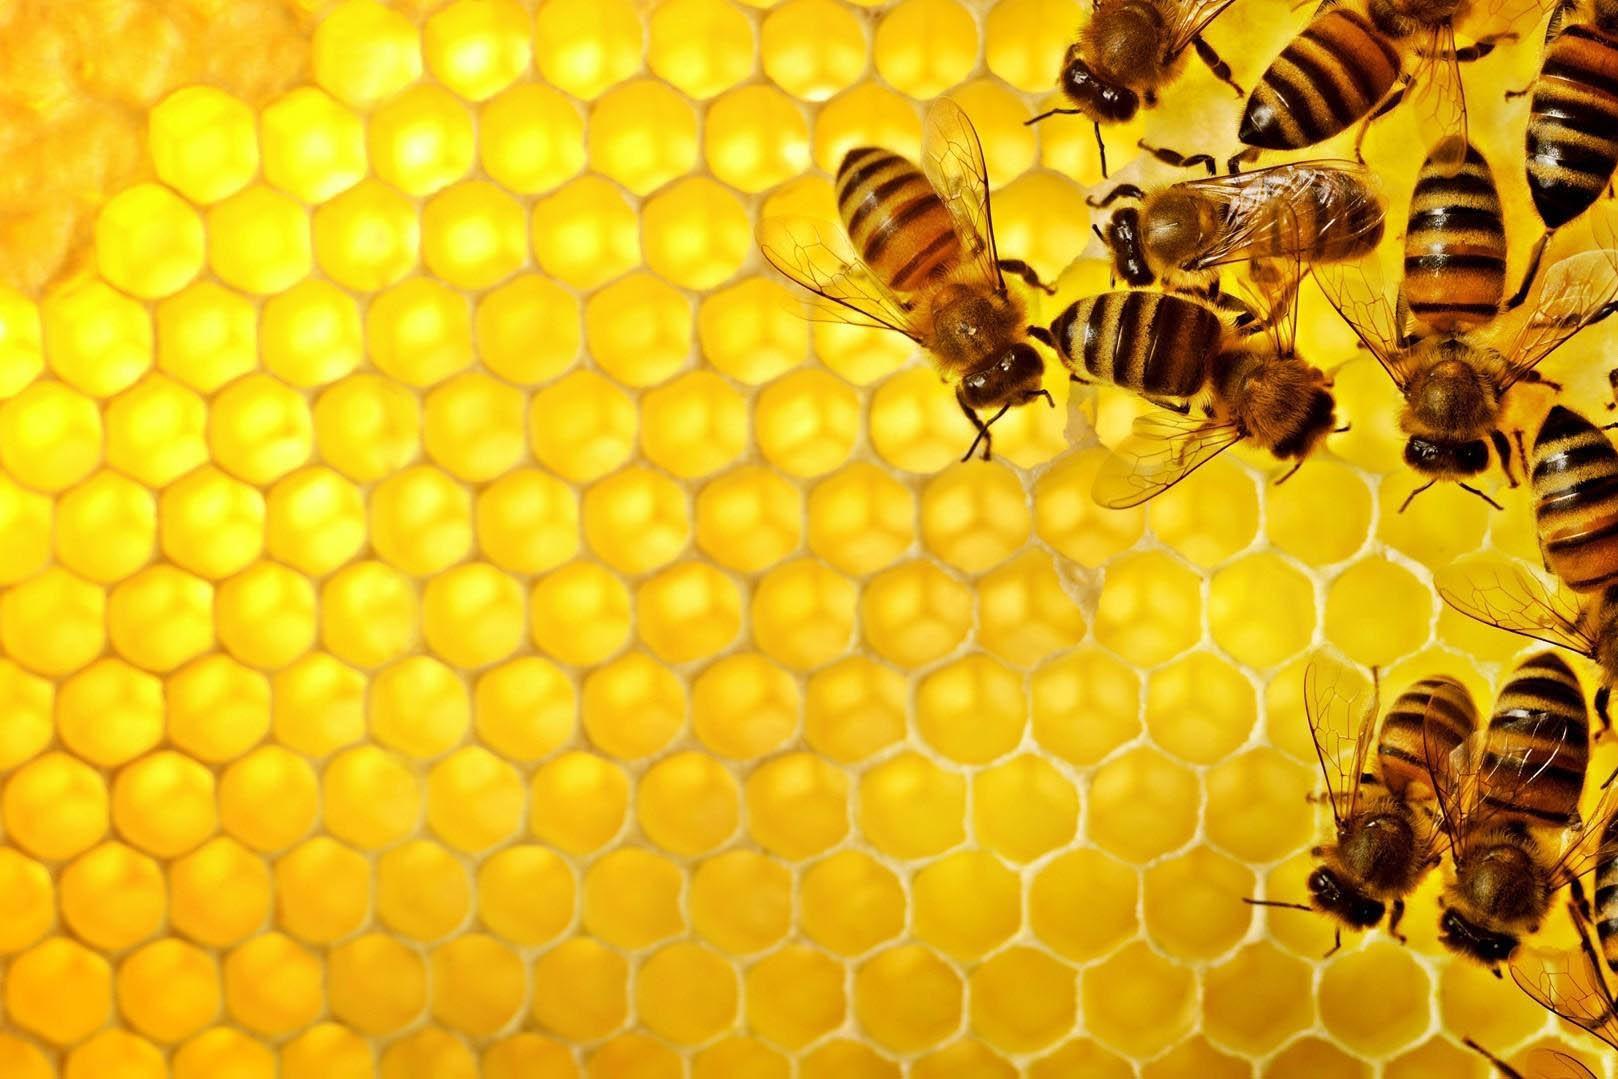 Focus Miele: api malate e produzione ai minimi storici. L'intervista.